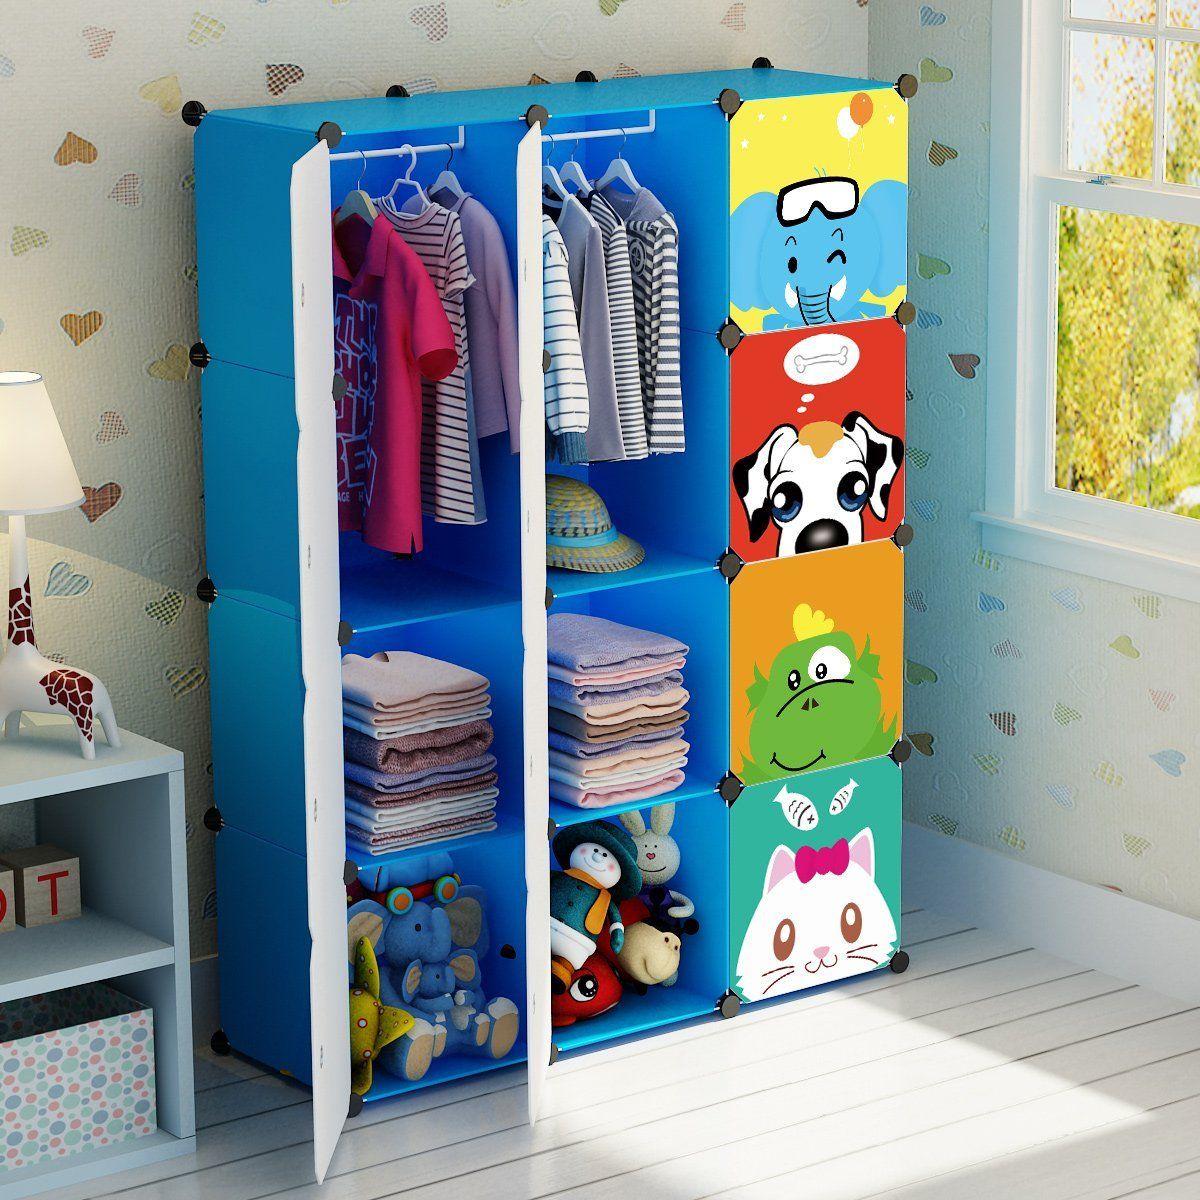 Kousi Portable Clothes Closet Wardrobe Freestanding Cute Cartoon Storage Organizer With Armarios Para Ninos Diseno De Cama Para Ninos Mueble Para Guardar Ropa